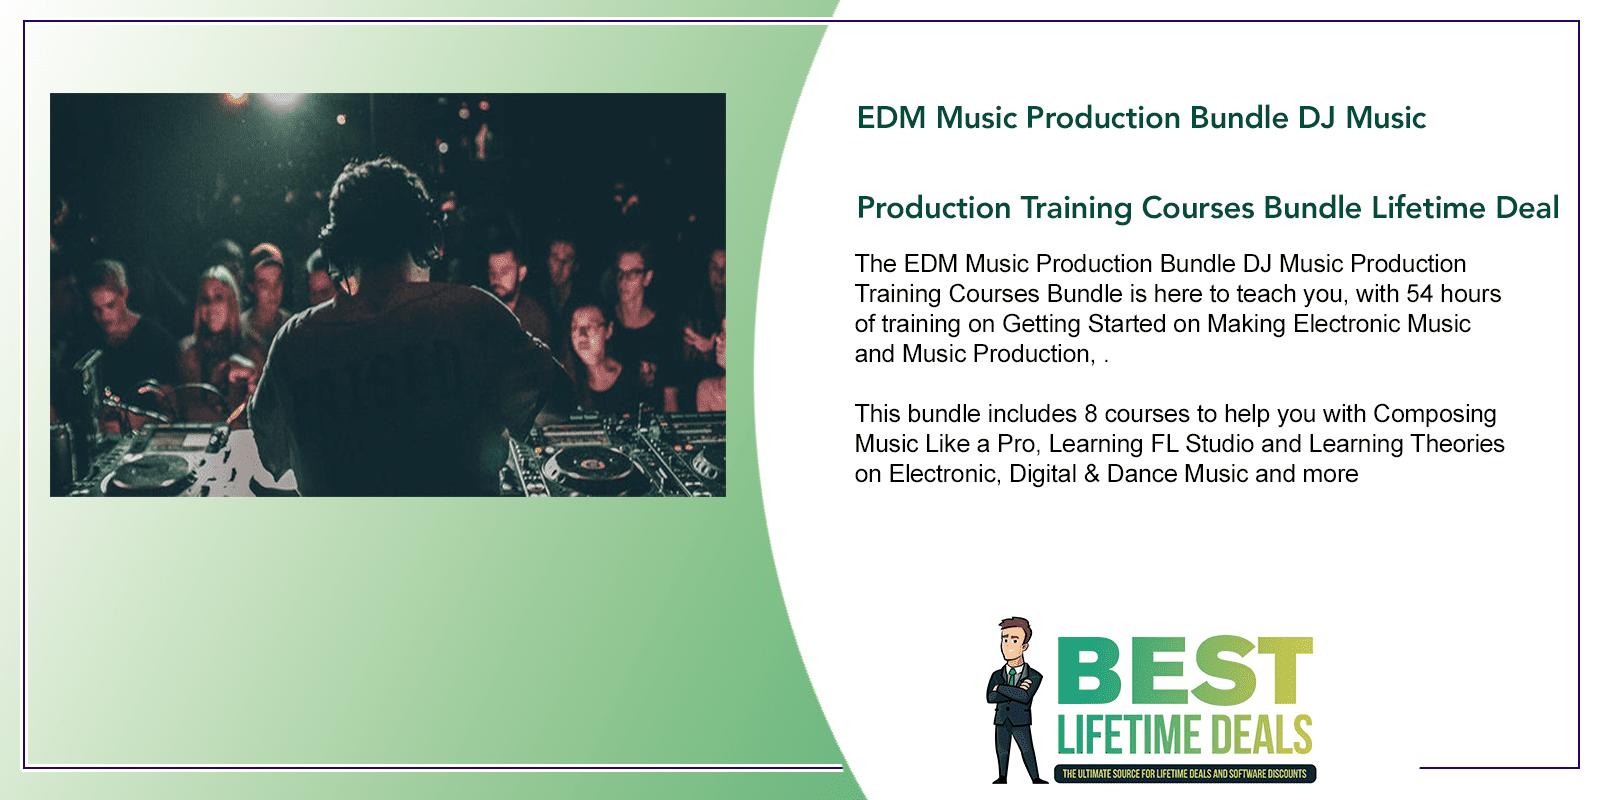 EDM Music Production Bundle DJ Music Production Training Courses Featured Image